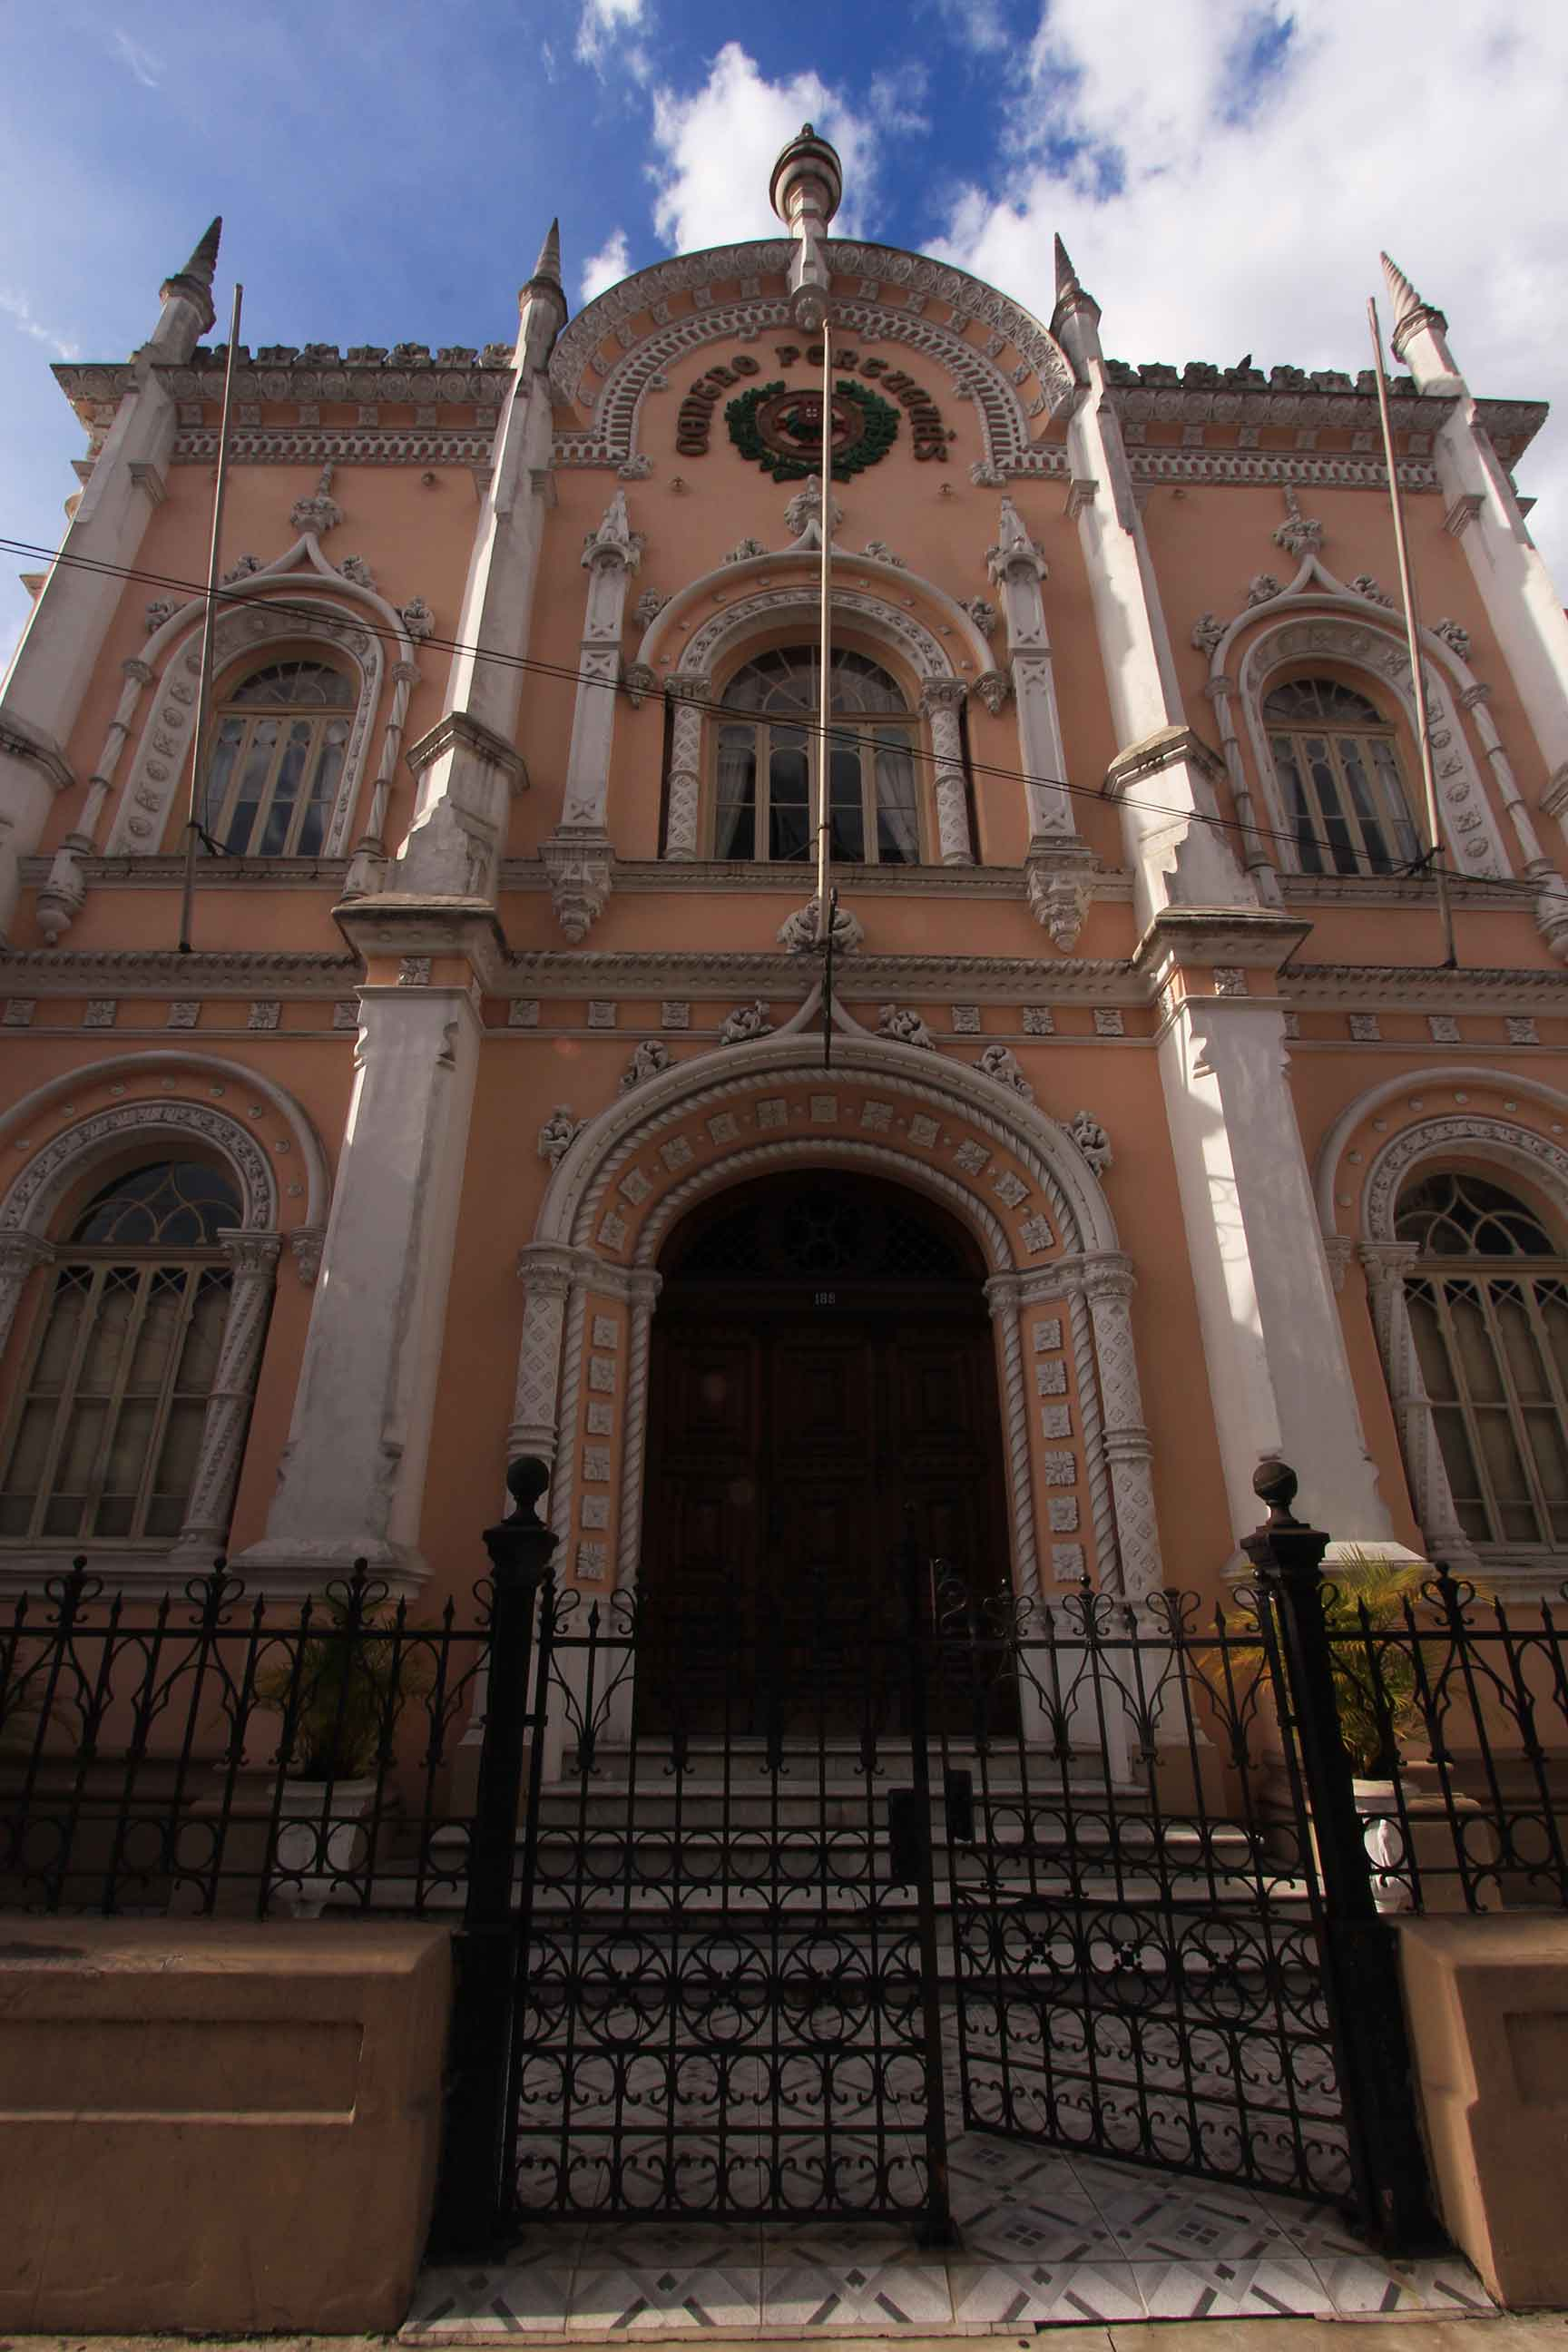 santos-cultura-arquitetura-sede-do-real-portugues-neomanoelino-1901-bx